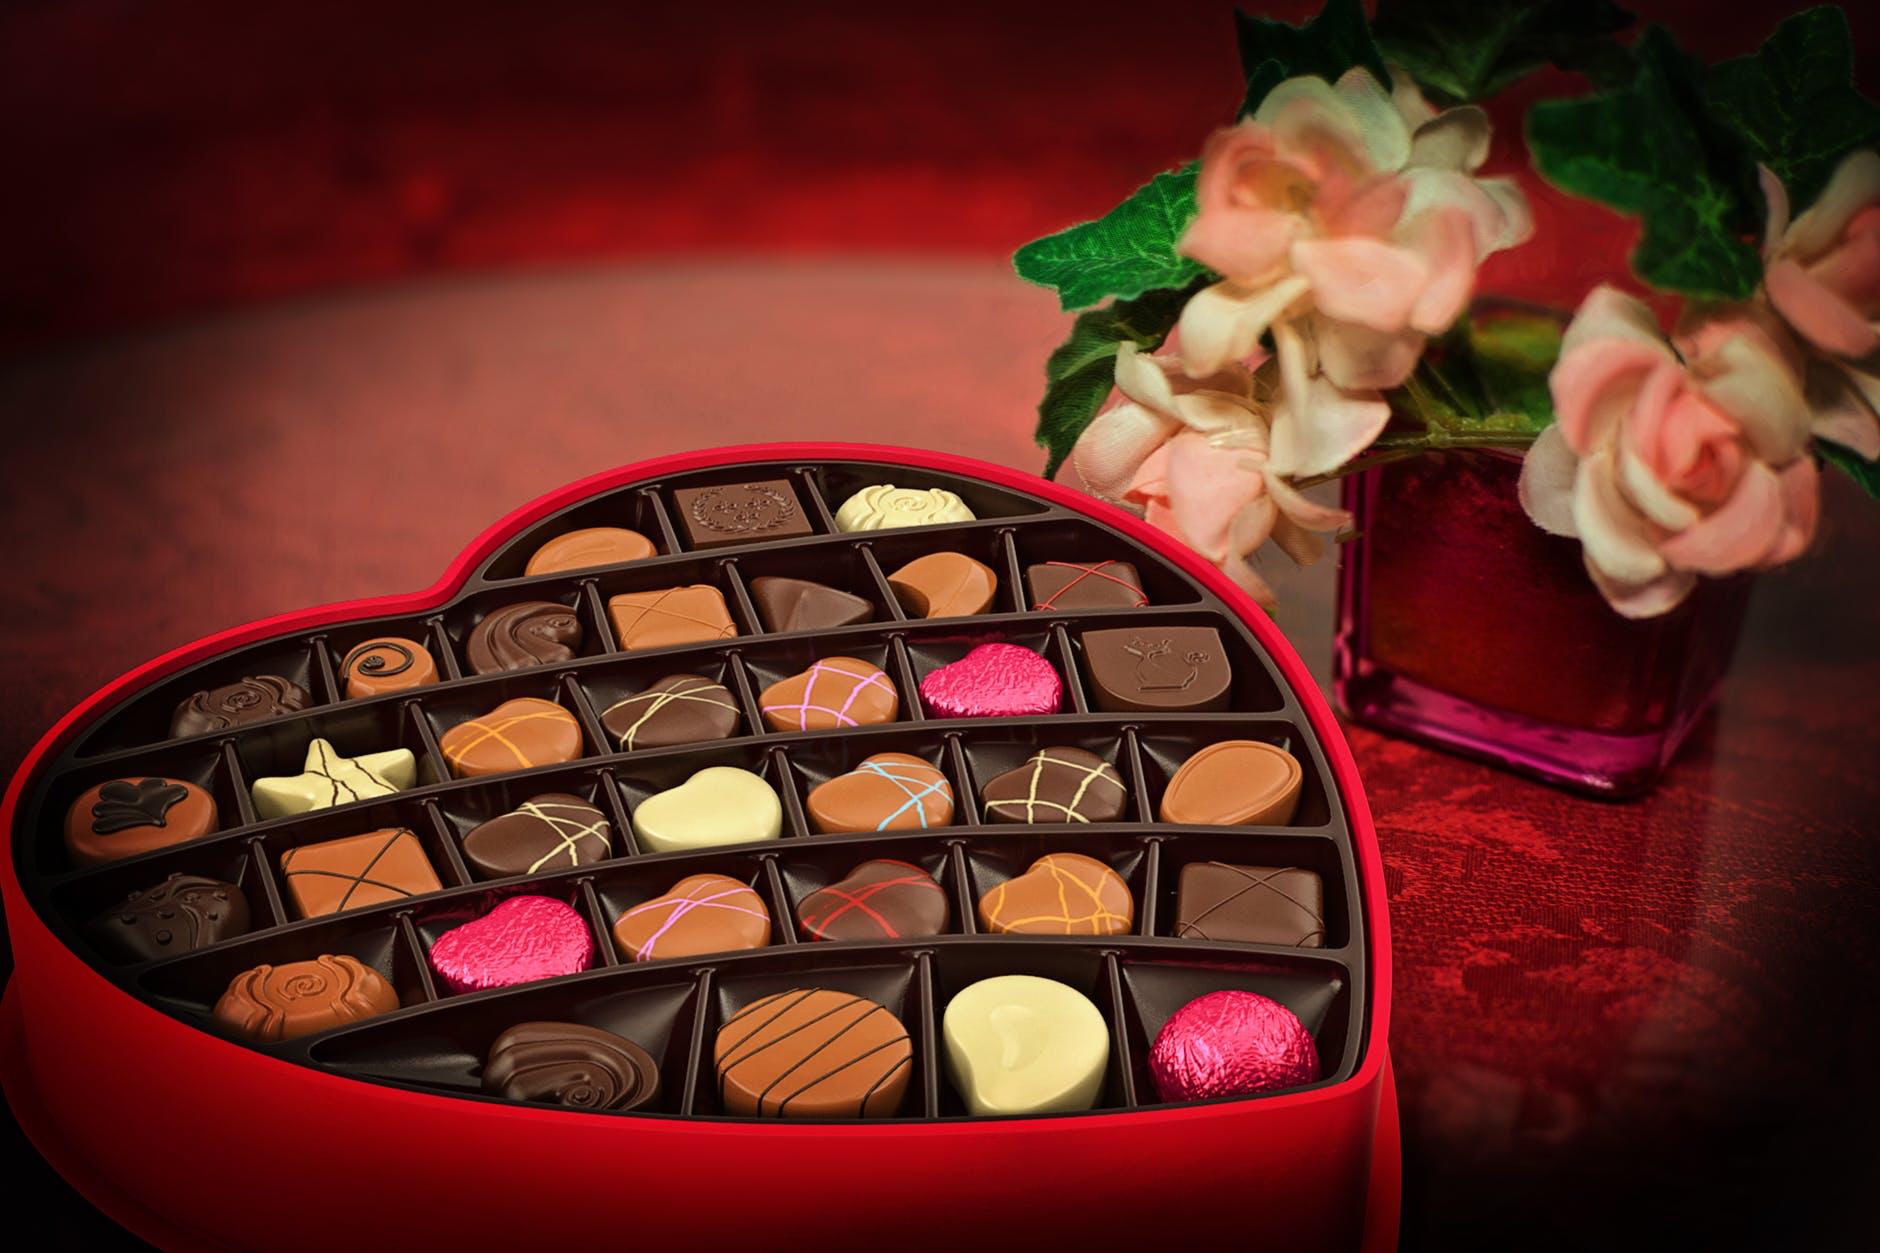 Box of chocolates